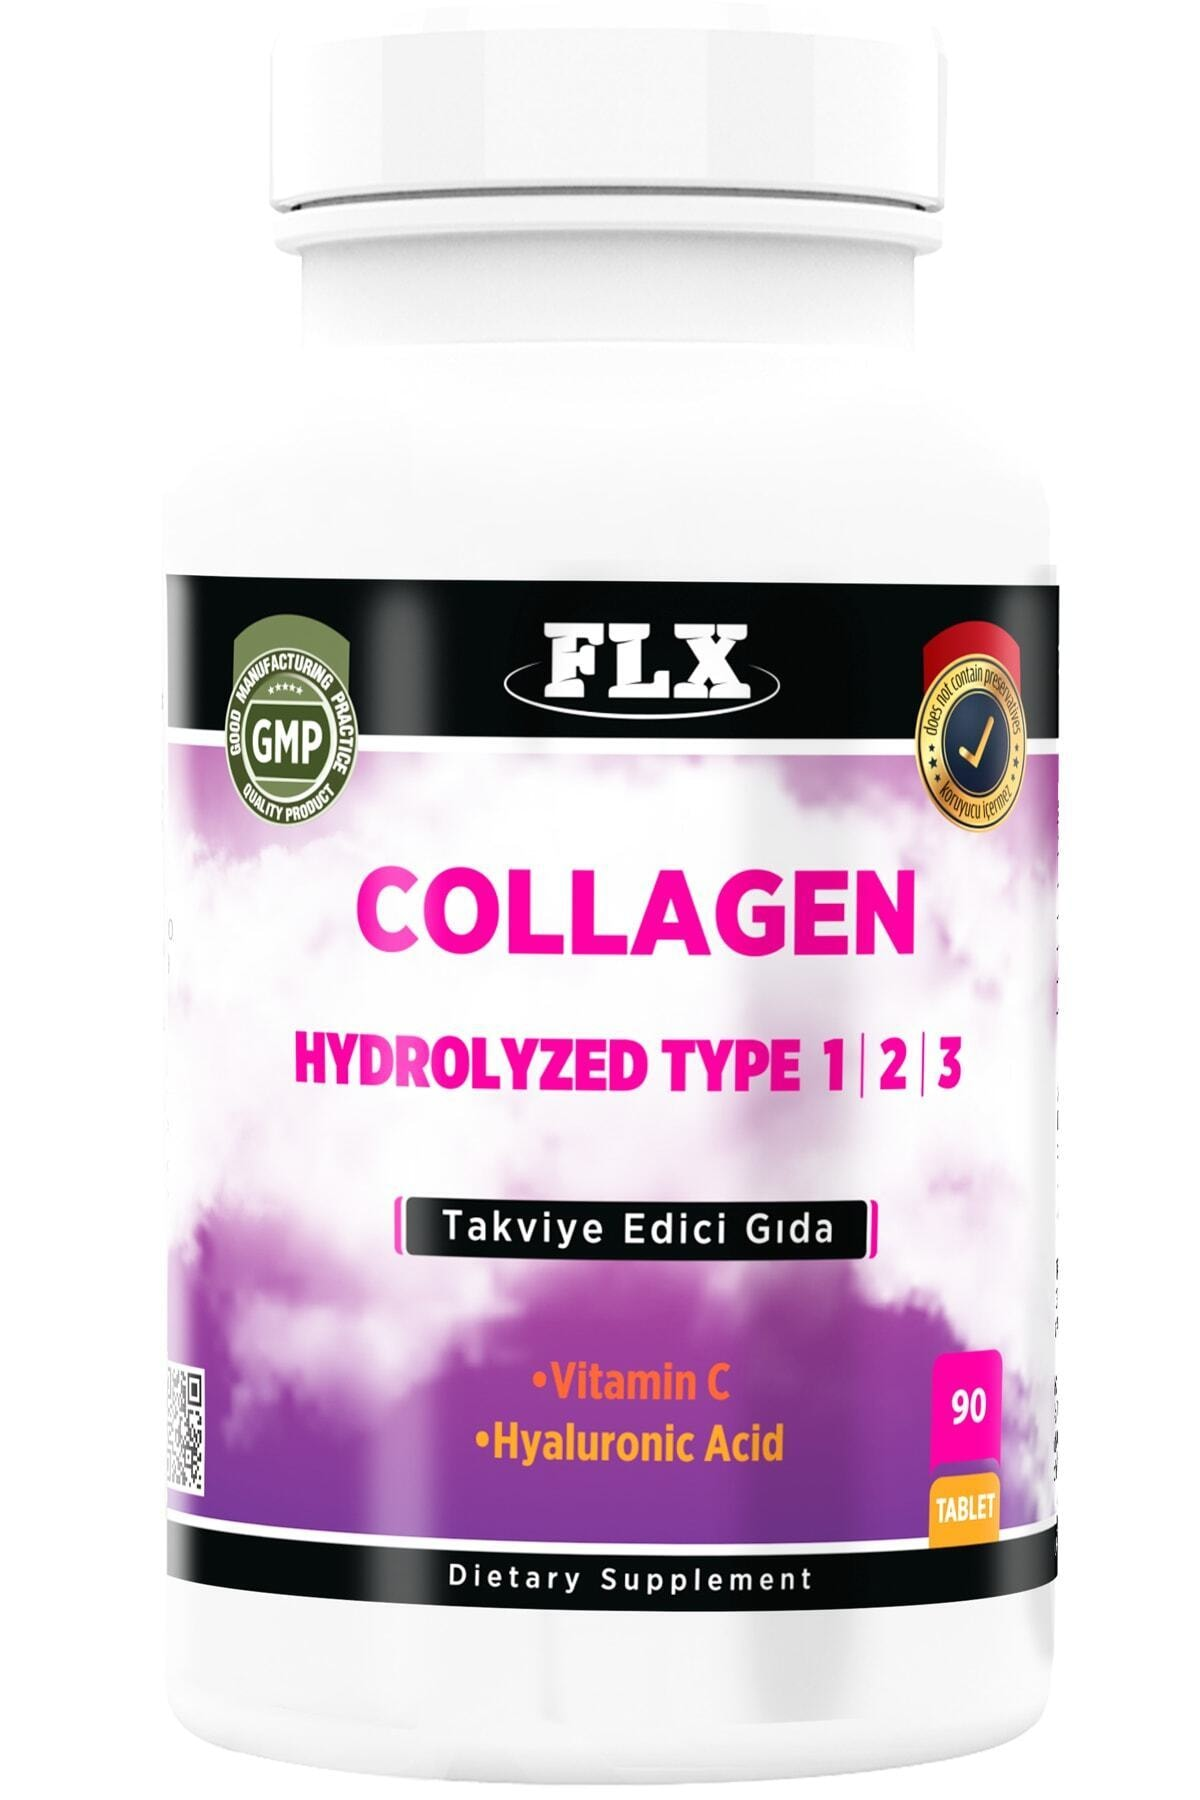 FLX Kollajen Tip-1 Tip-2 Tip-3 Hyaluronic Asit Vitamin C 90 Tablet Collagen 1